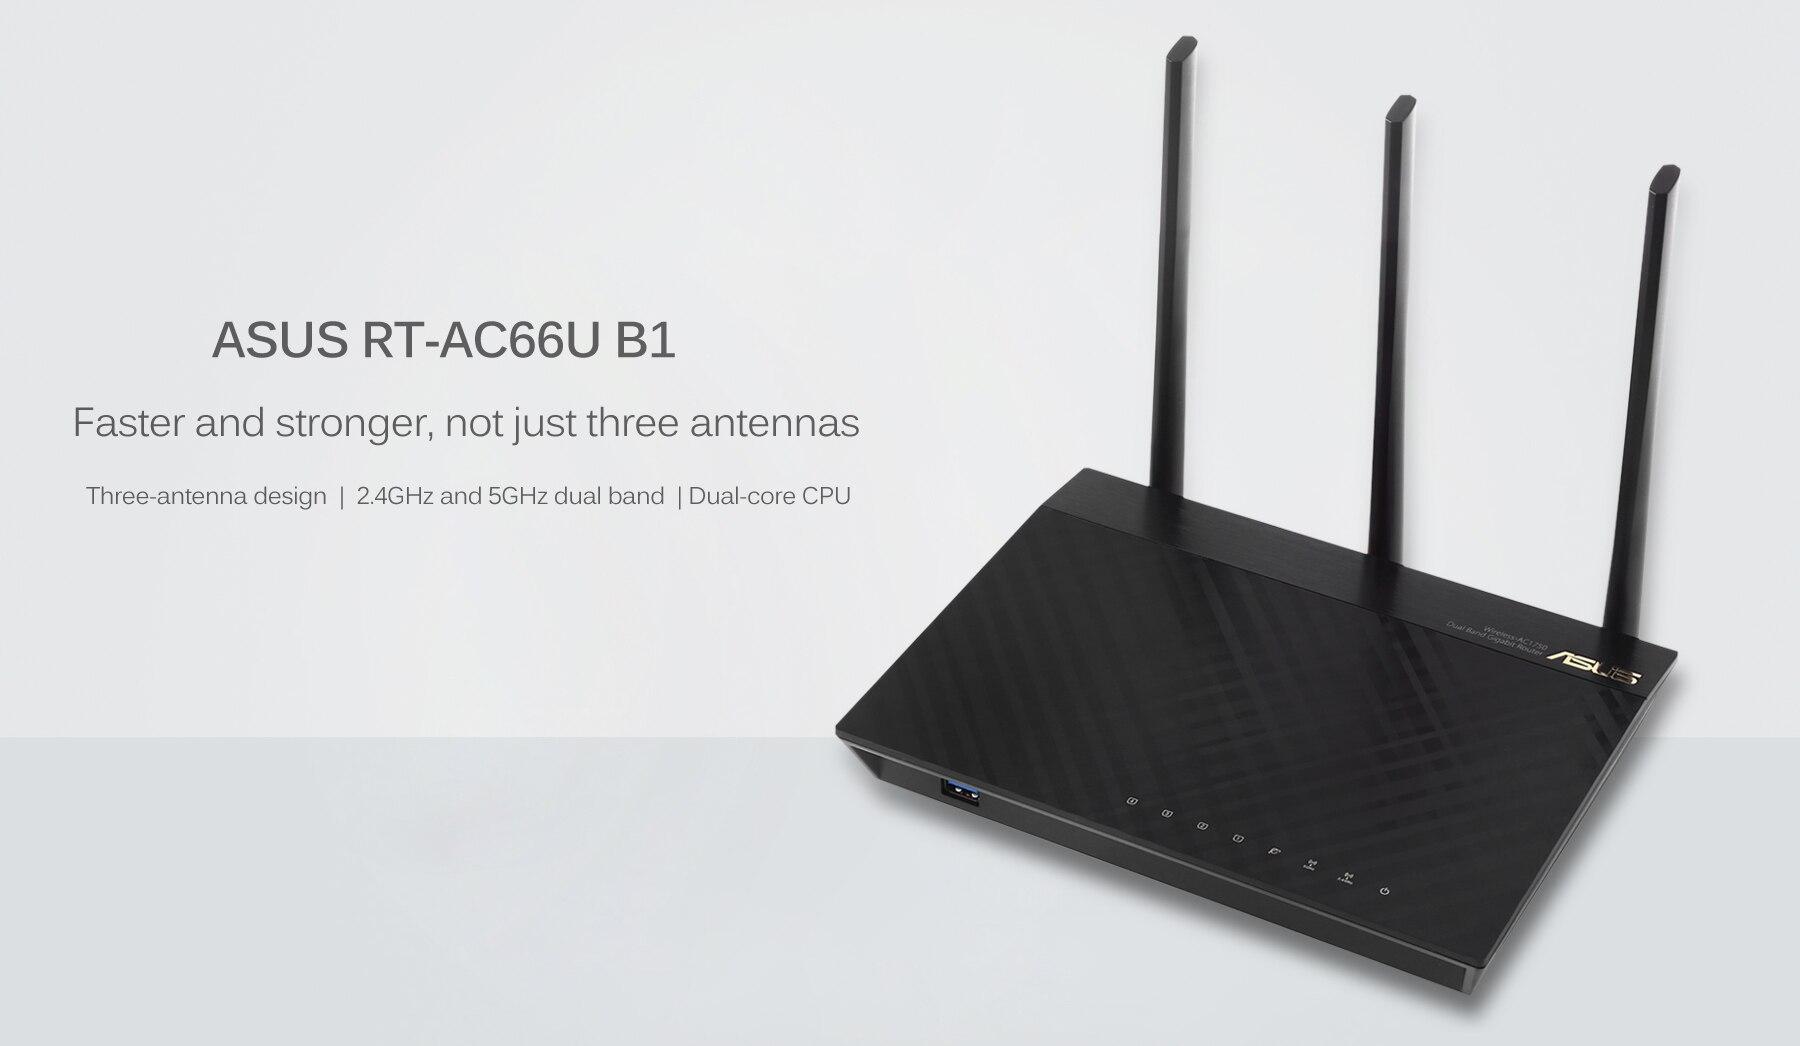 ASUS RT-AC66U B1 Dual-Band 3x3 AC1750 Wi-Fi 4-Port Gigabit Router